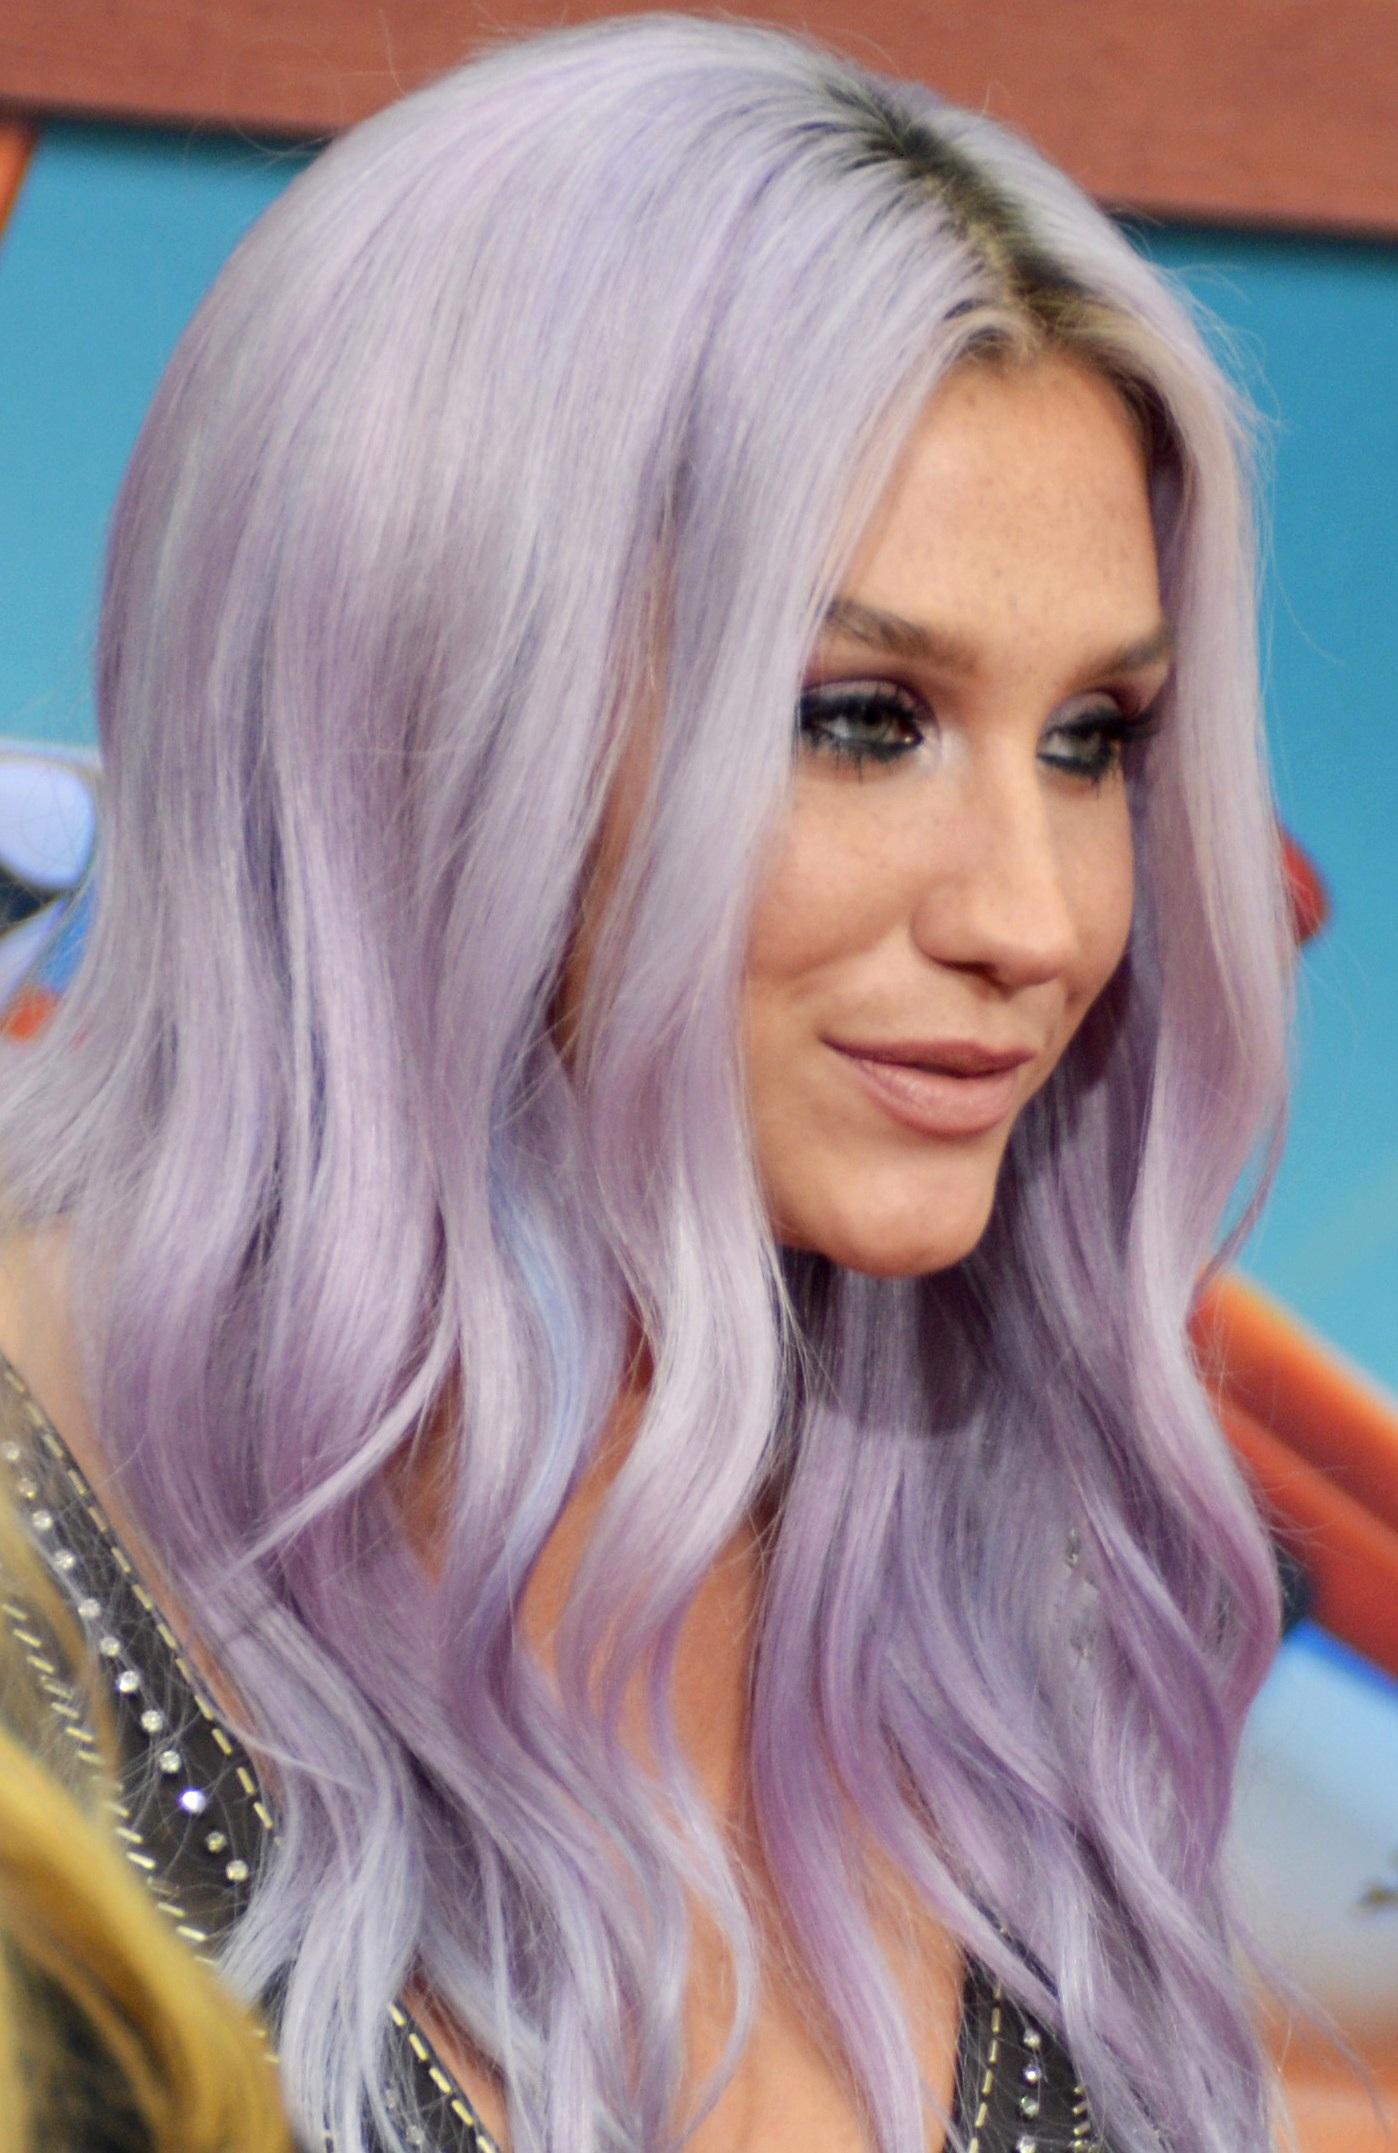 Kesha And Zedd Premiere New Song Modern Frequency - Kesha-no-makeup